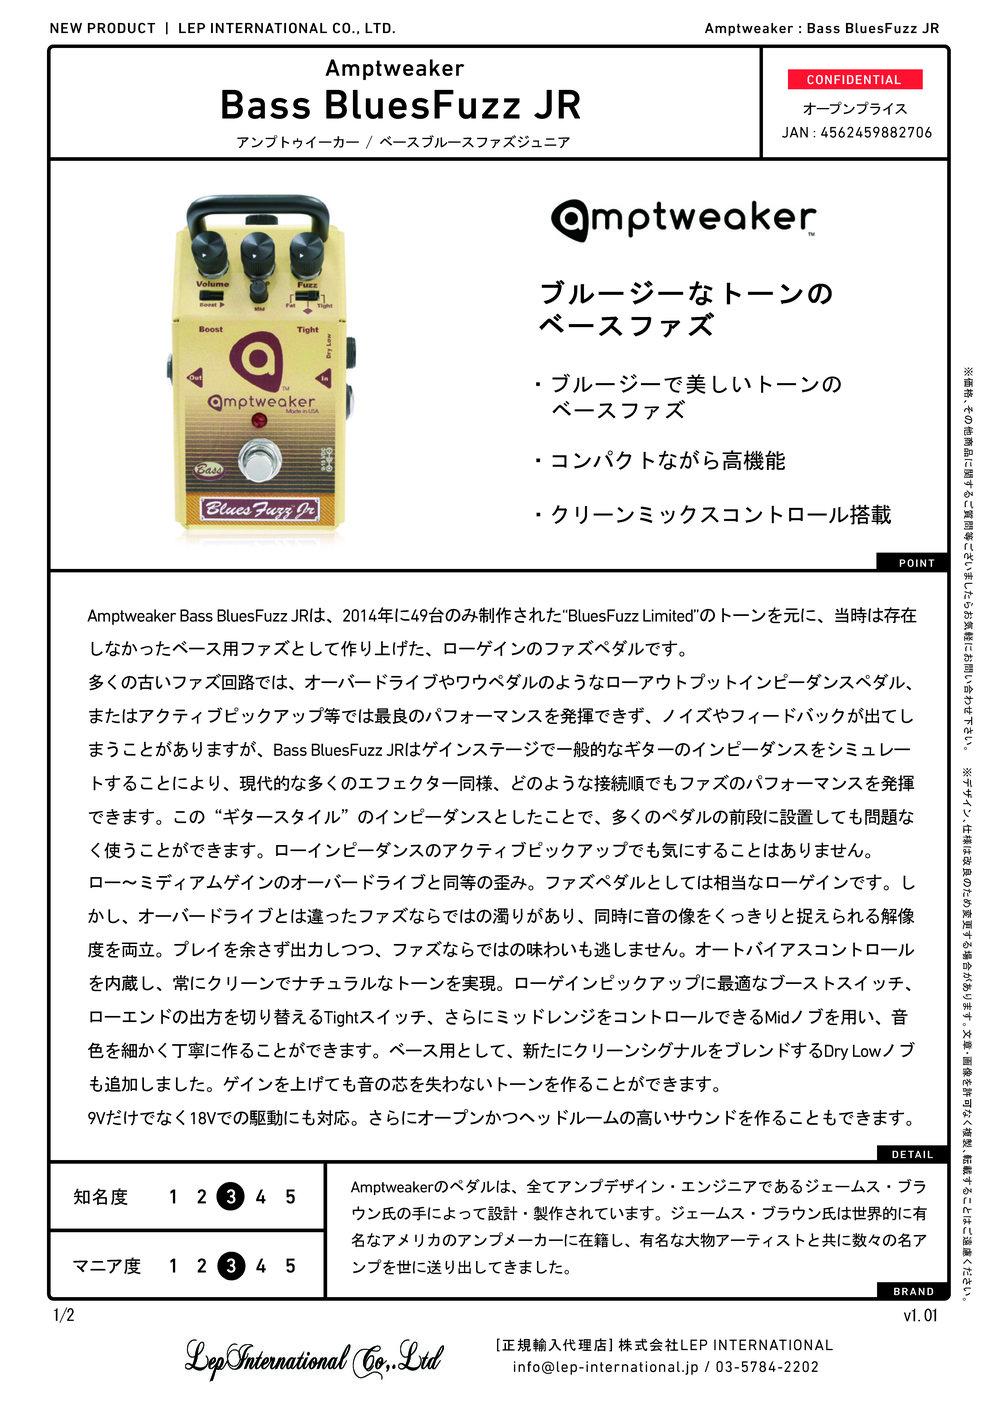 amptweaker bassbluesfuzzjr v1.01_ページ_1.jpg